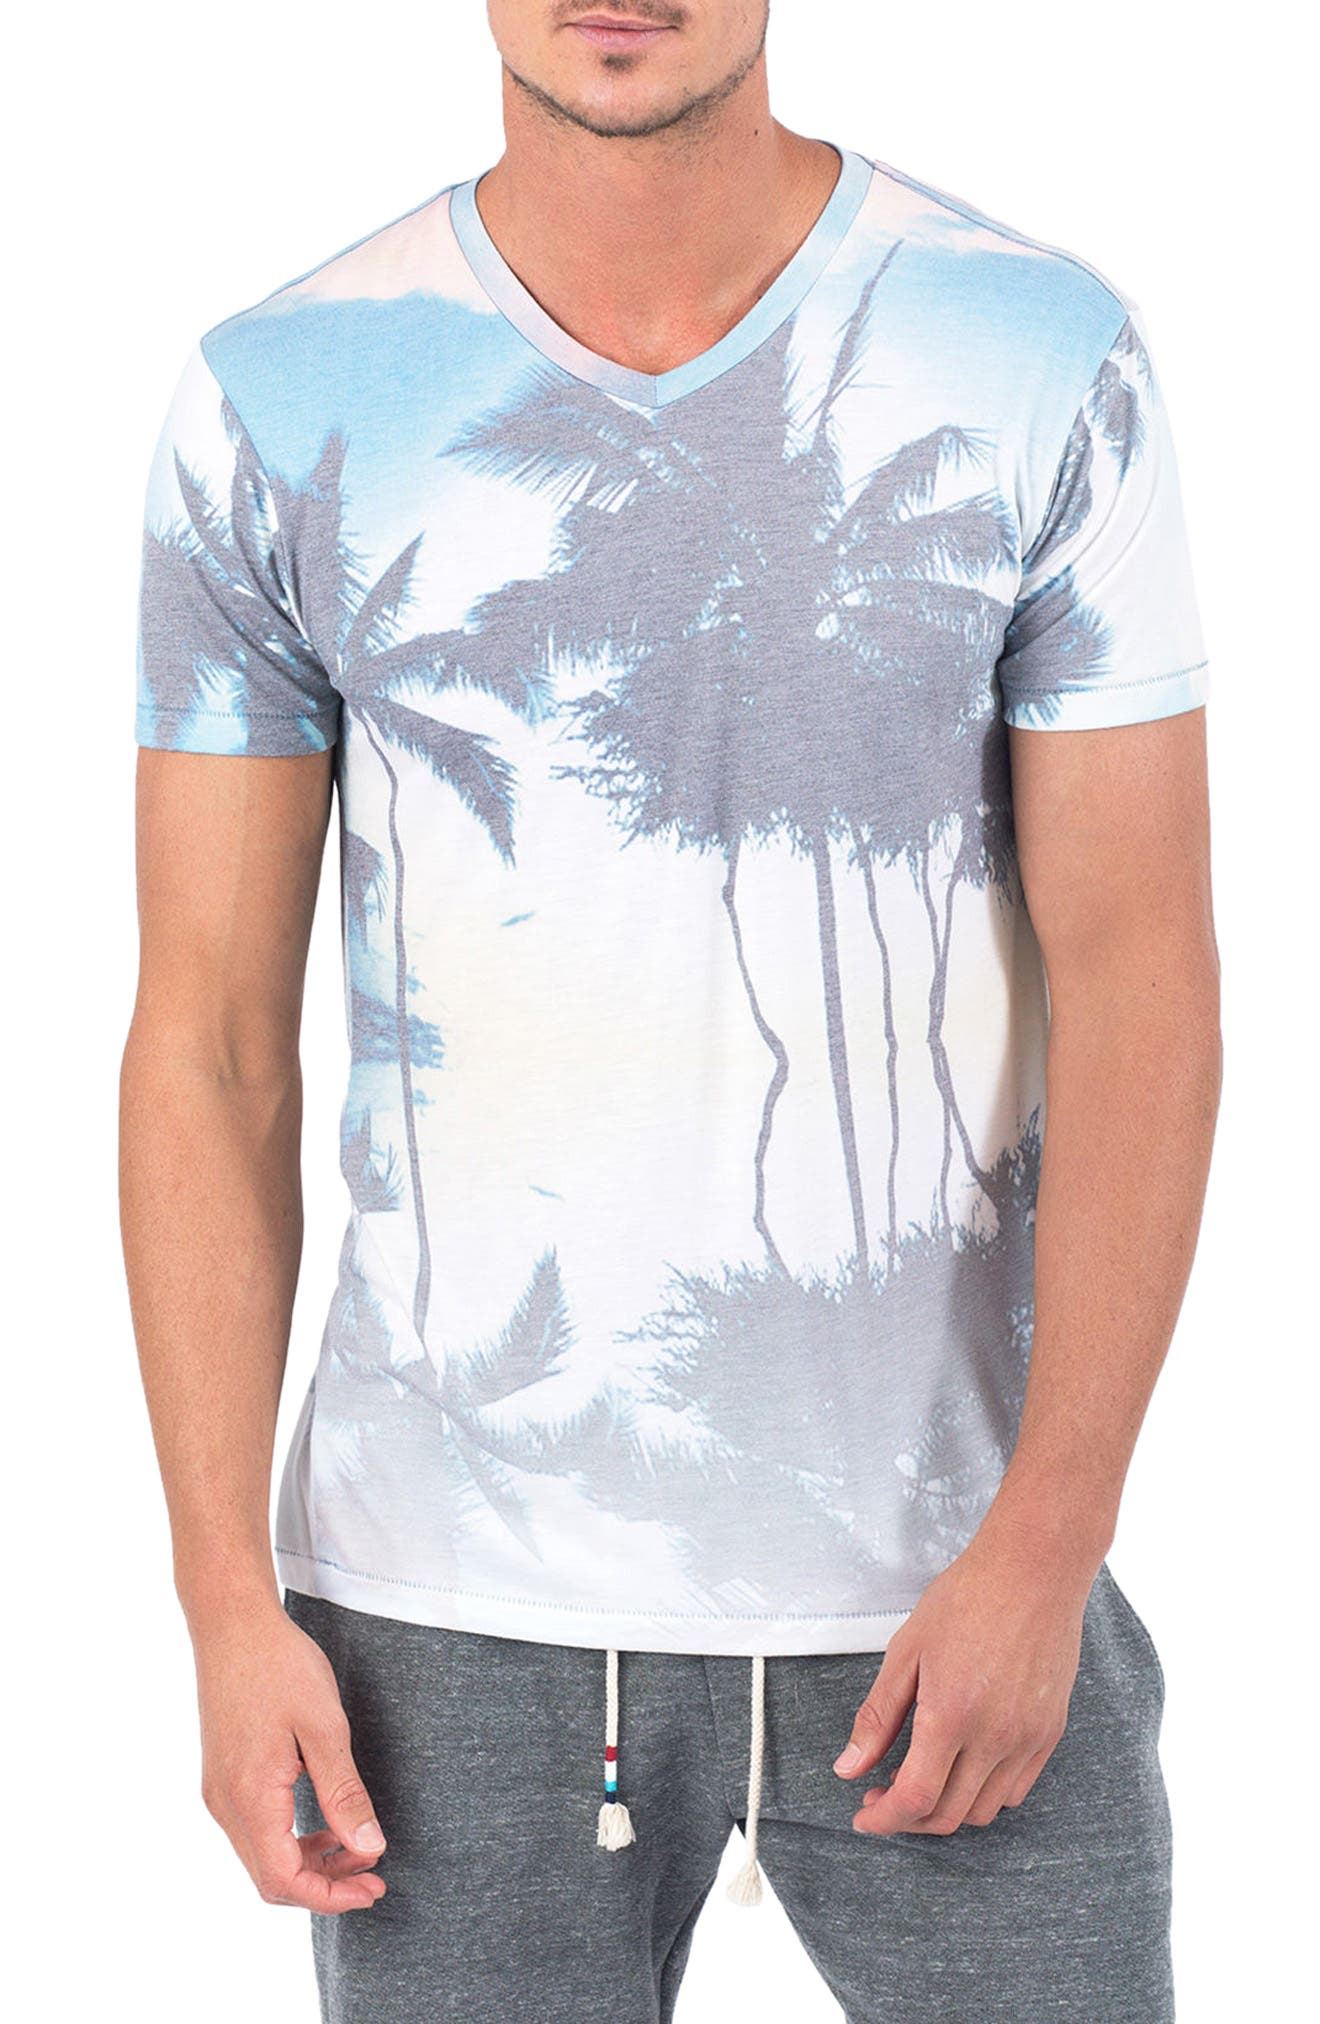 Off Tropic T-Shirt,                             Main thumbnail 1, color,                             OFF TROPIC